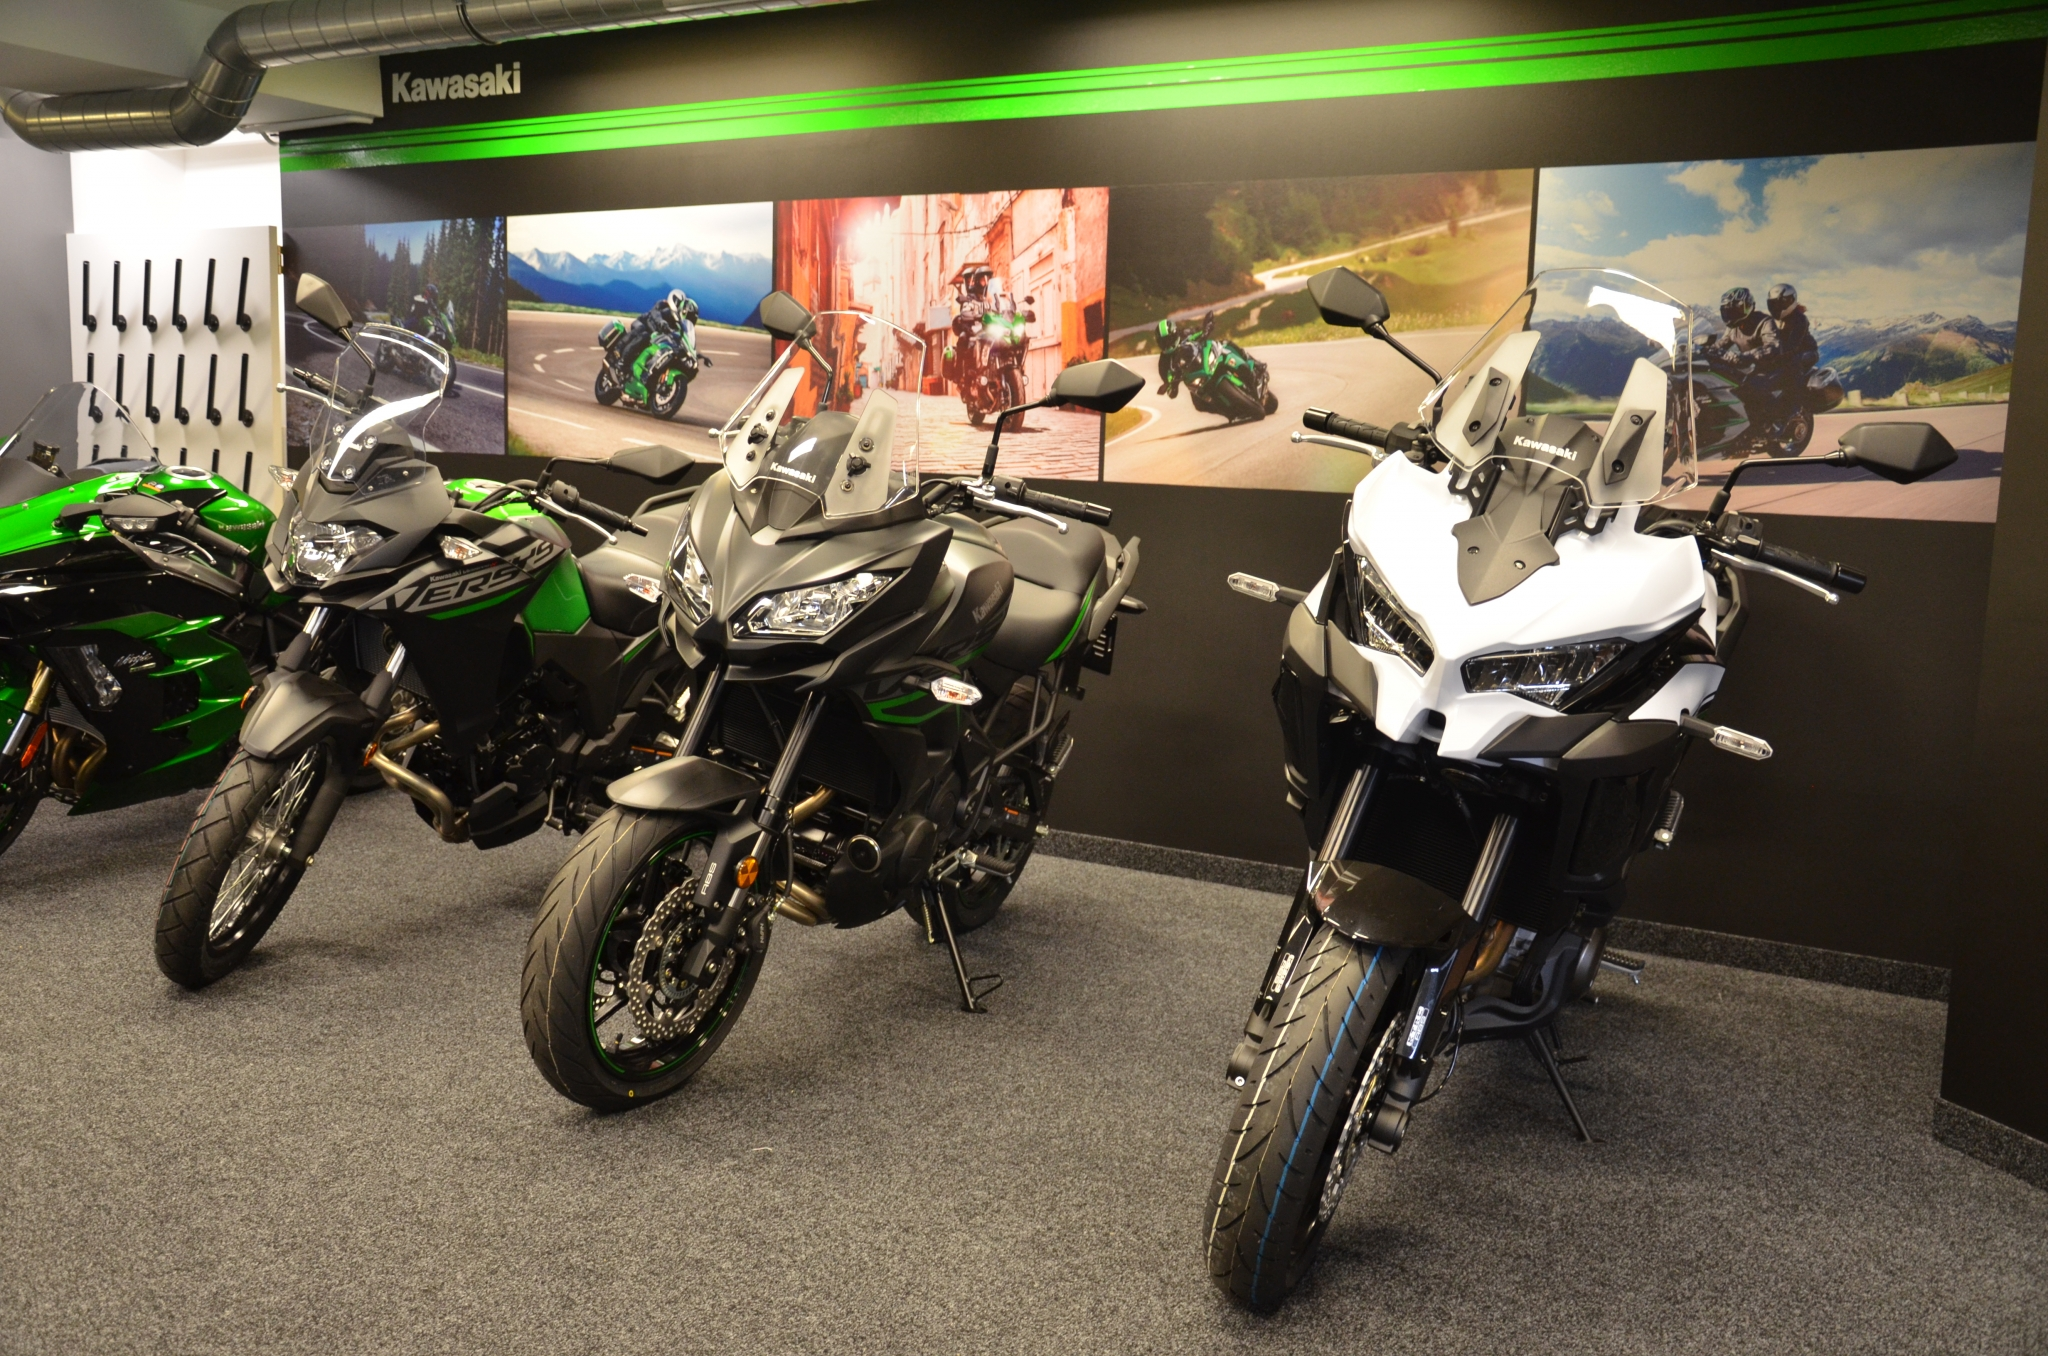 Kawasaki prodejna Praha Vrbovka